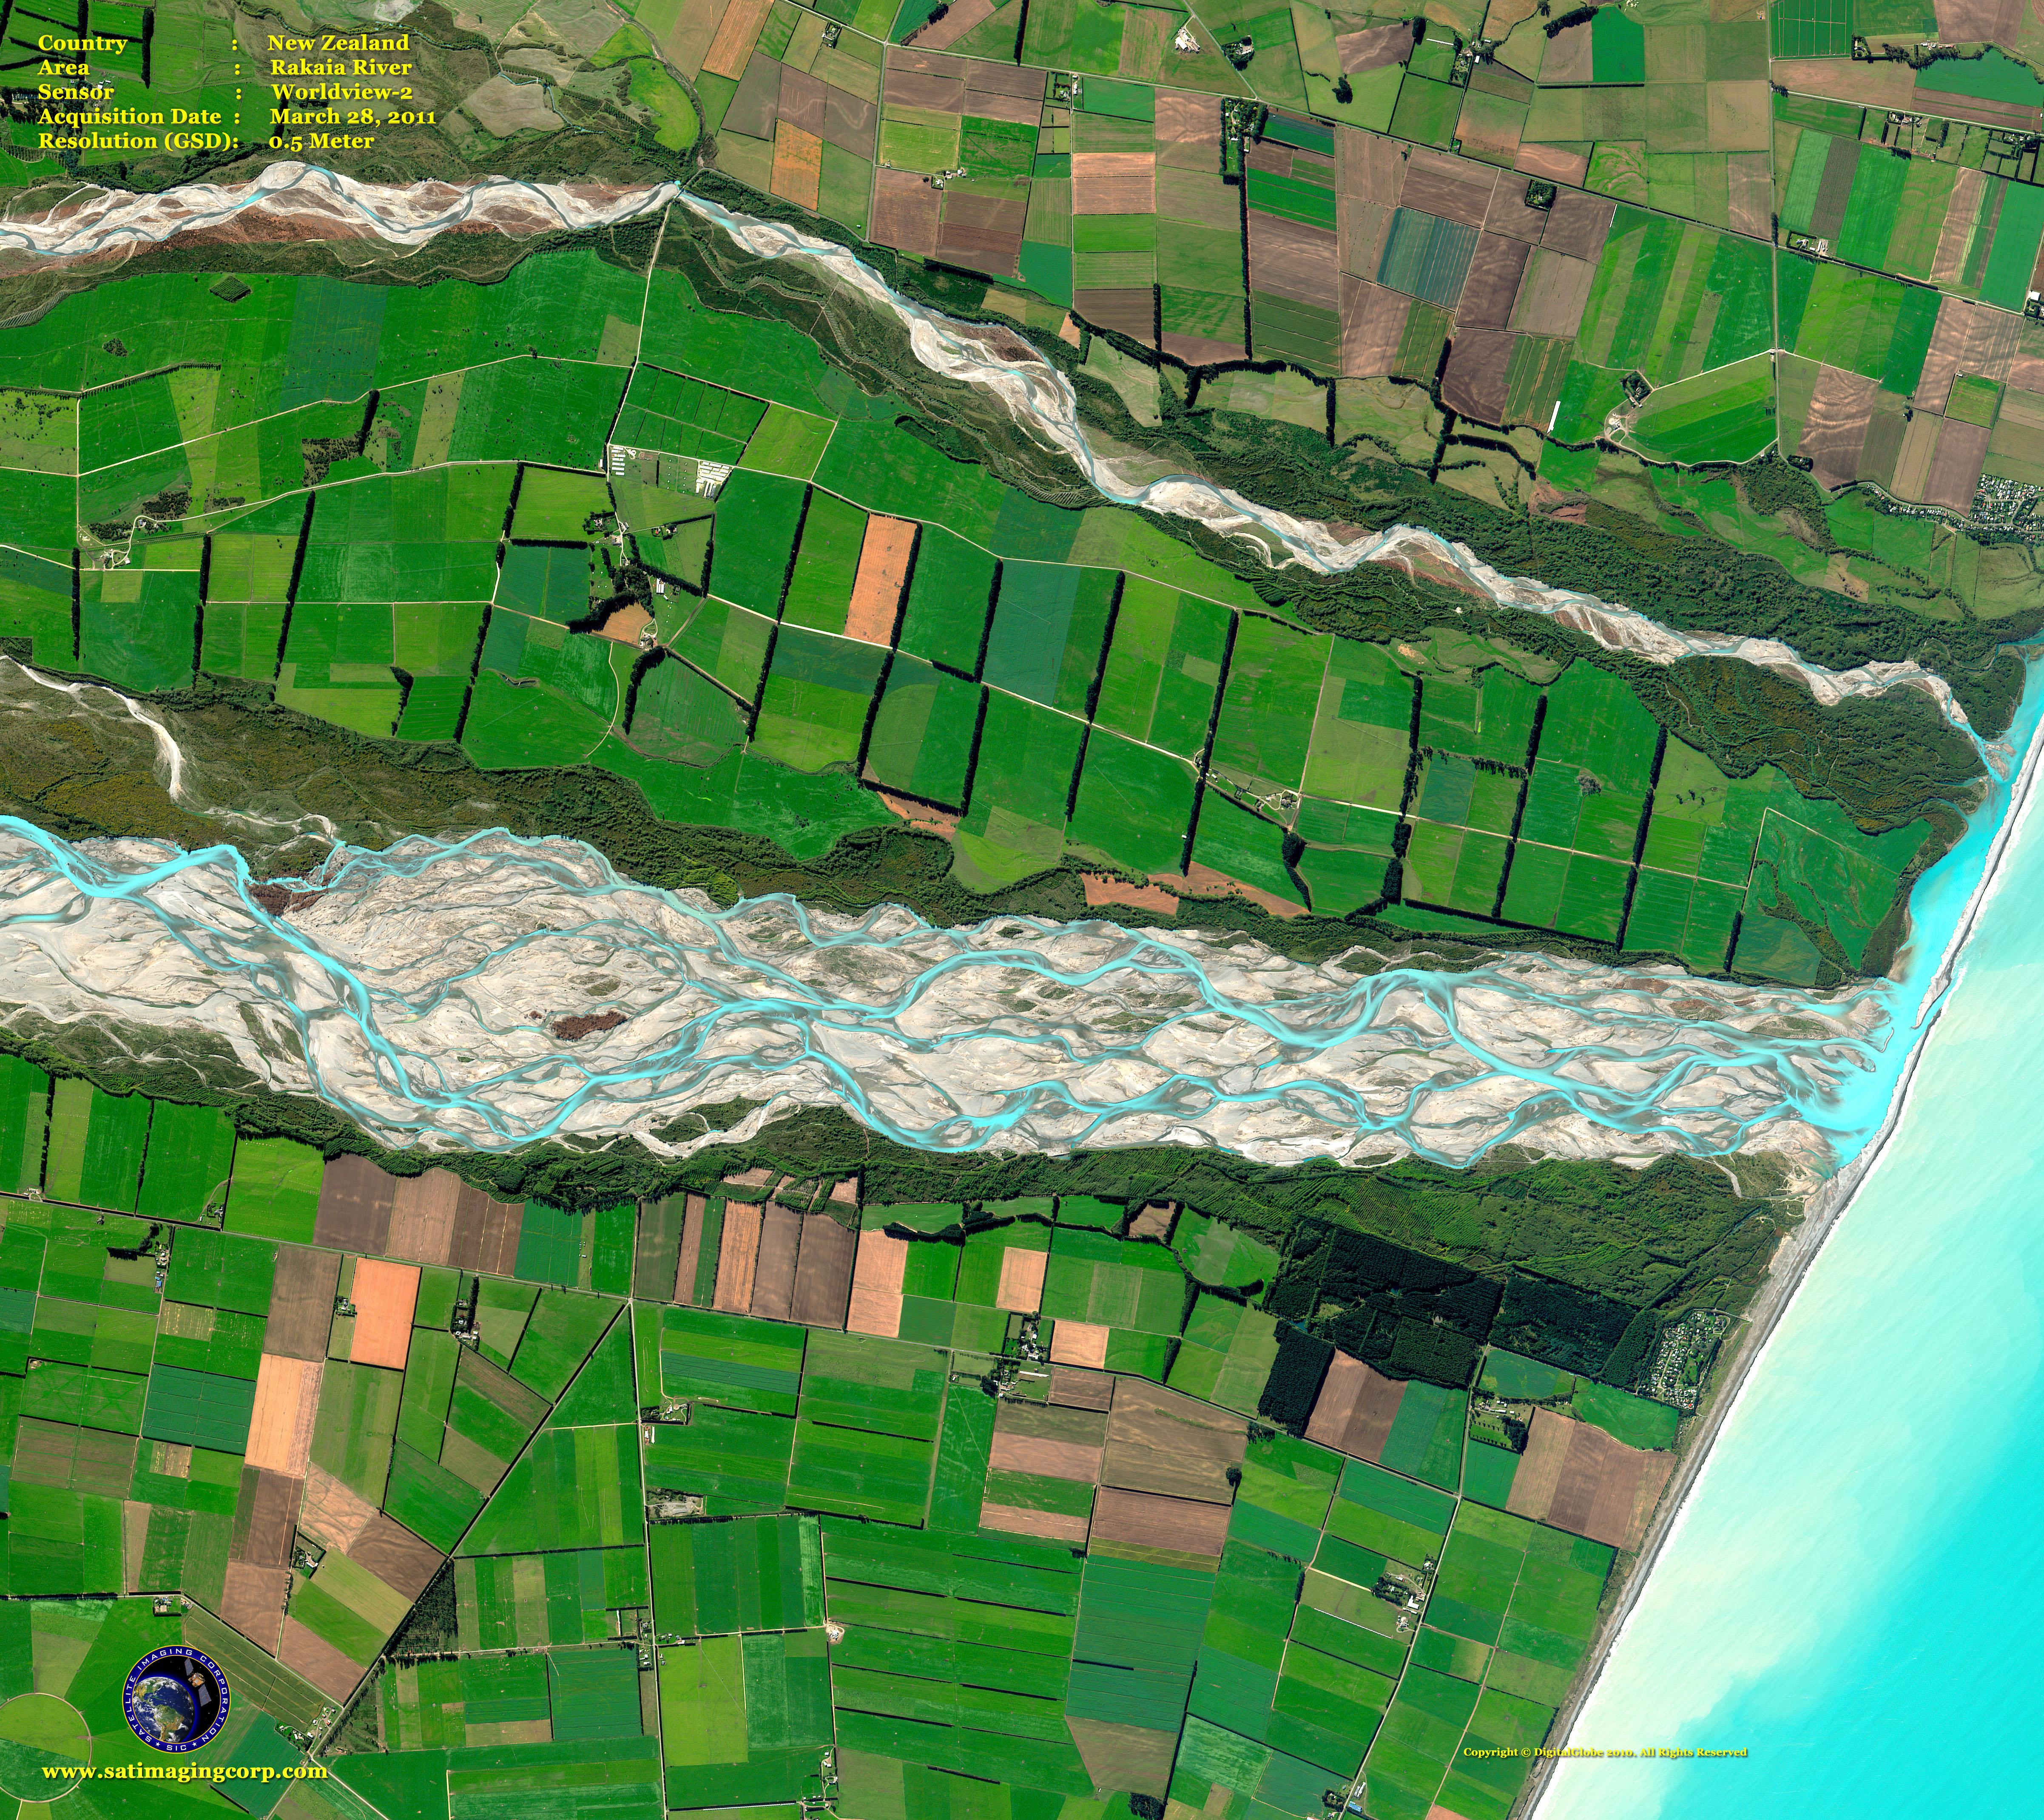 worldview2 satellite image of the rakaia river